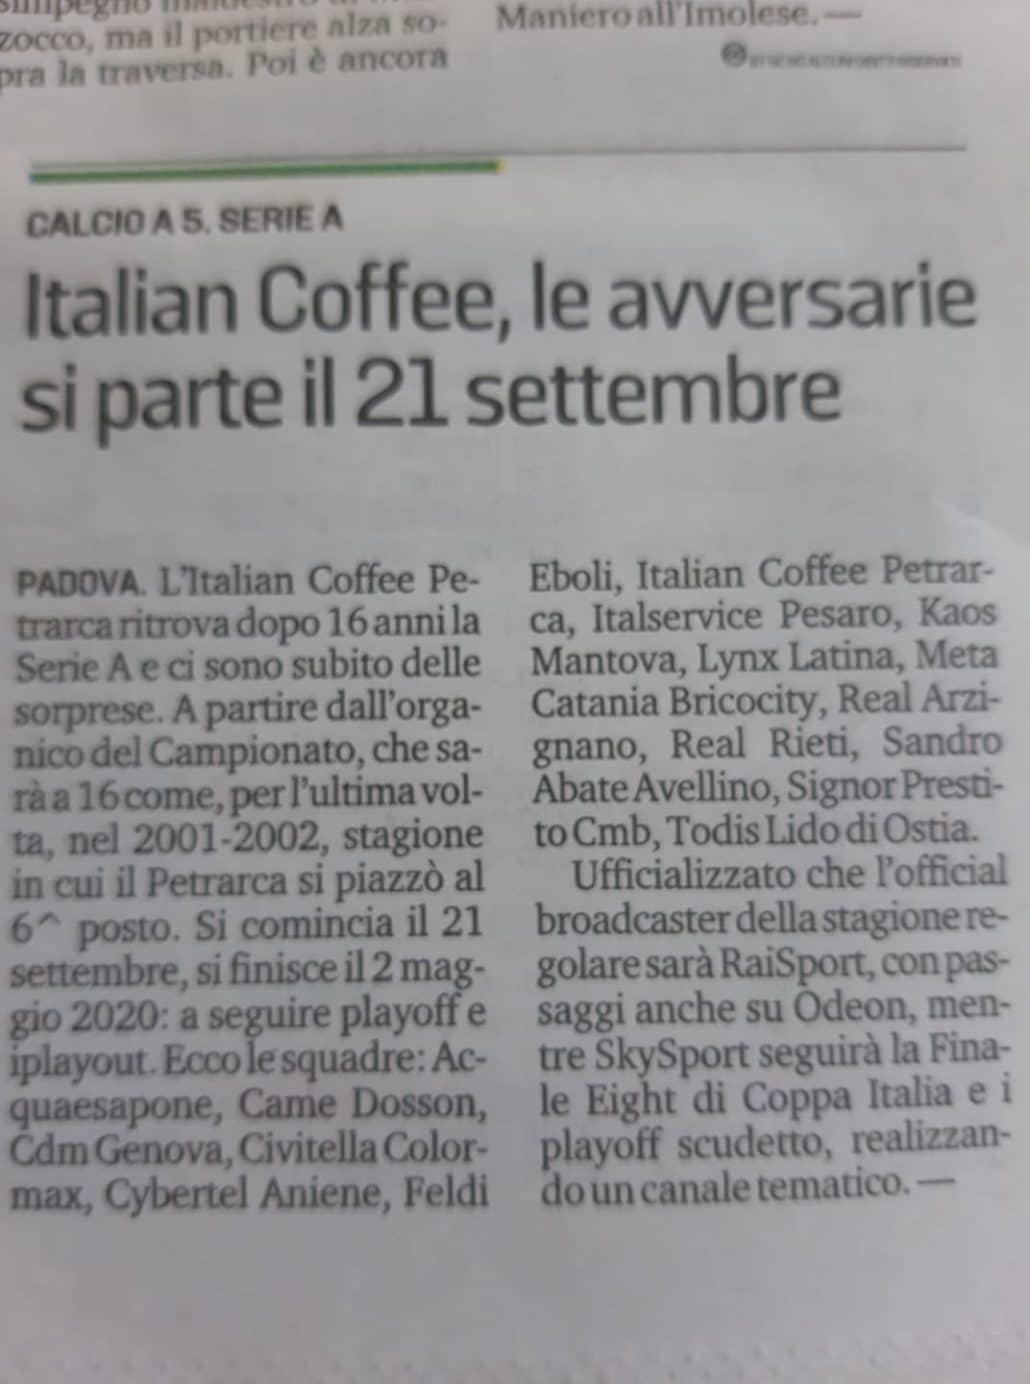 Calendario Calcio Padova.Italian Coffee Petrarca Ecco Il Calendario Articolo